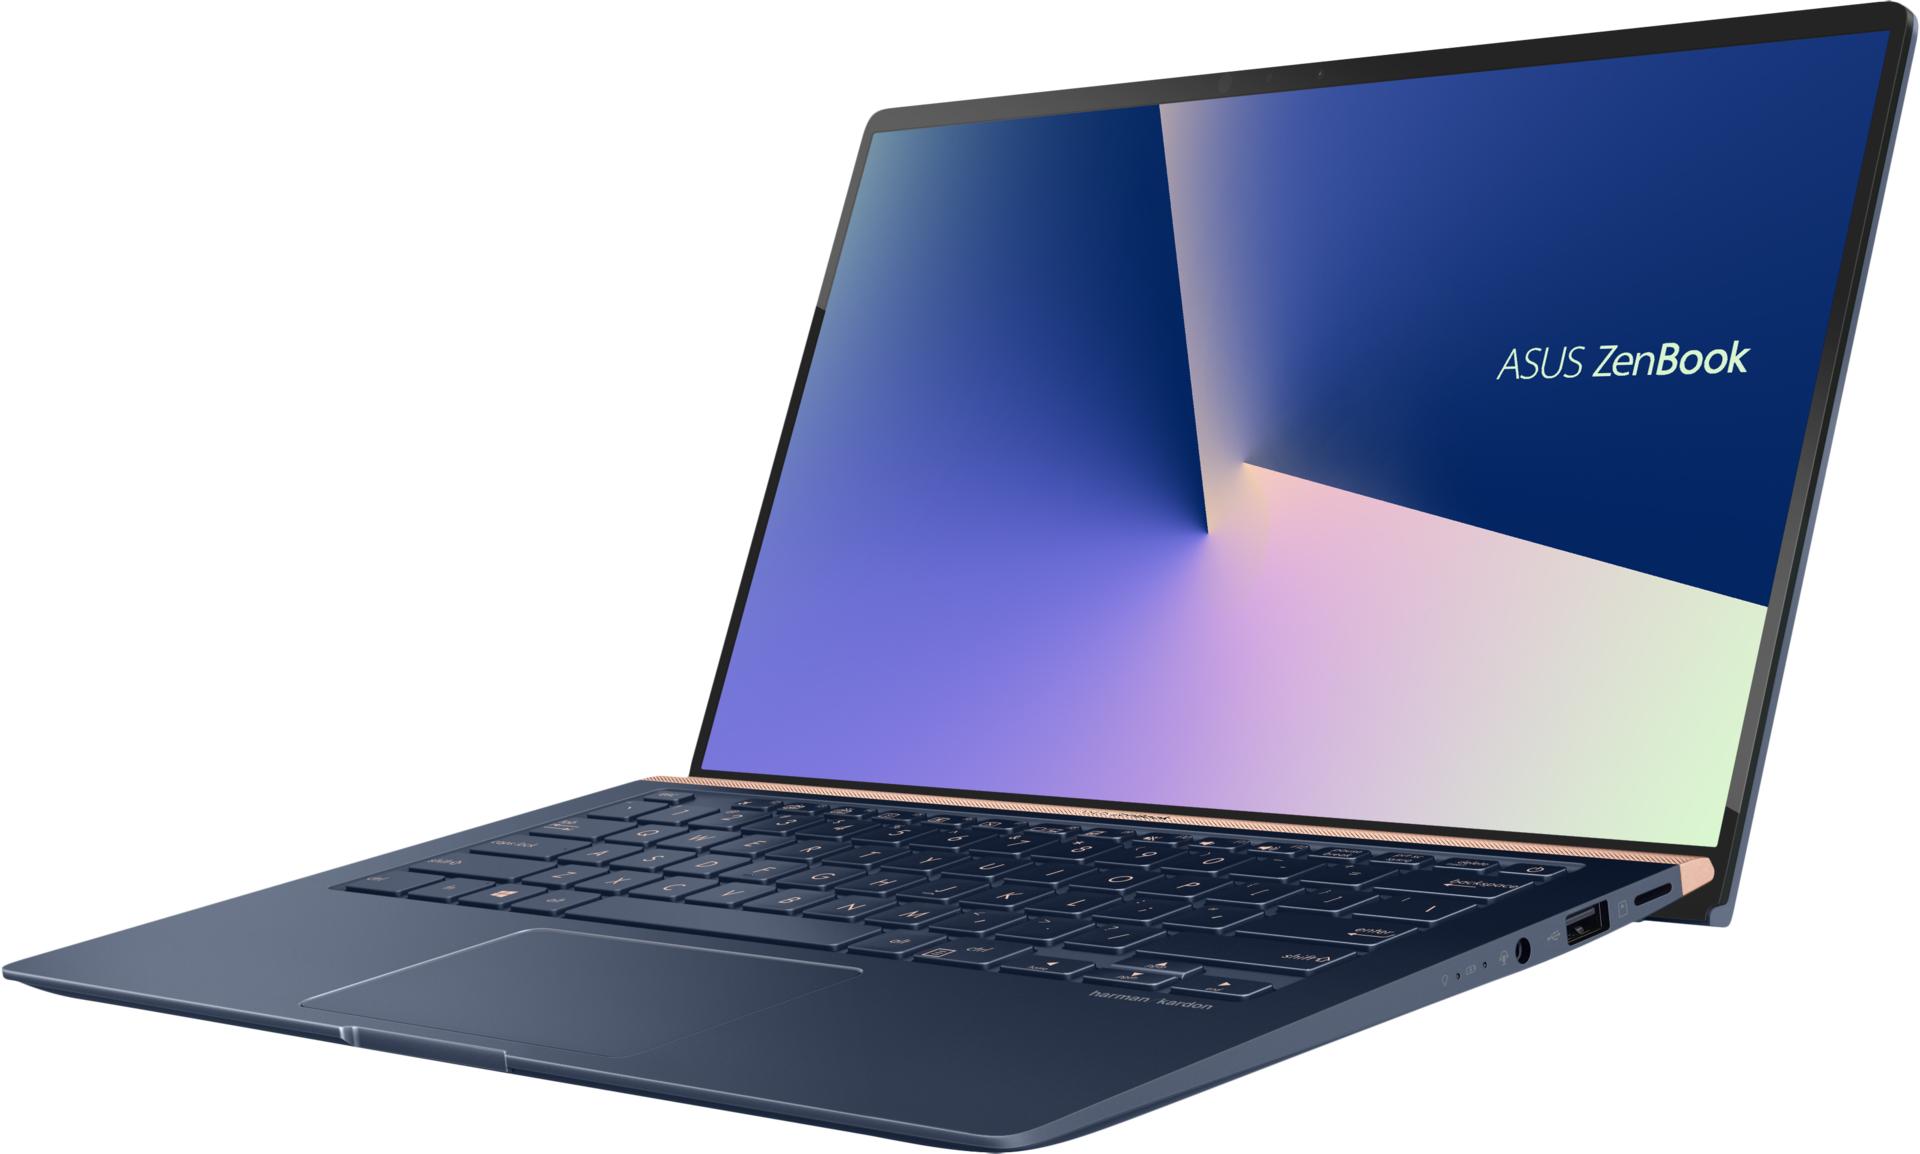 Portátil ASUS ZenBook 14 (14'', Intel Core i7-8565U, RAM: 8 GB, 256 GB SSD)